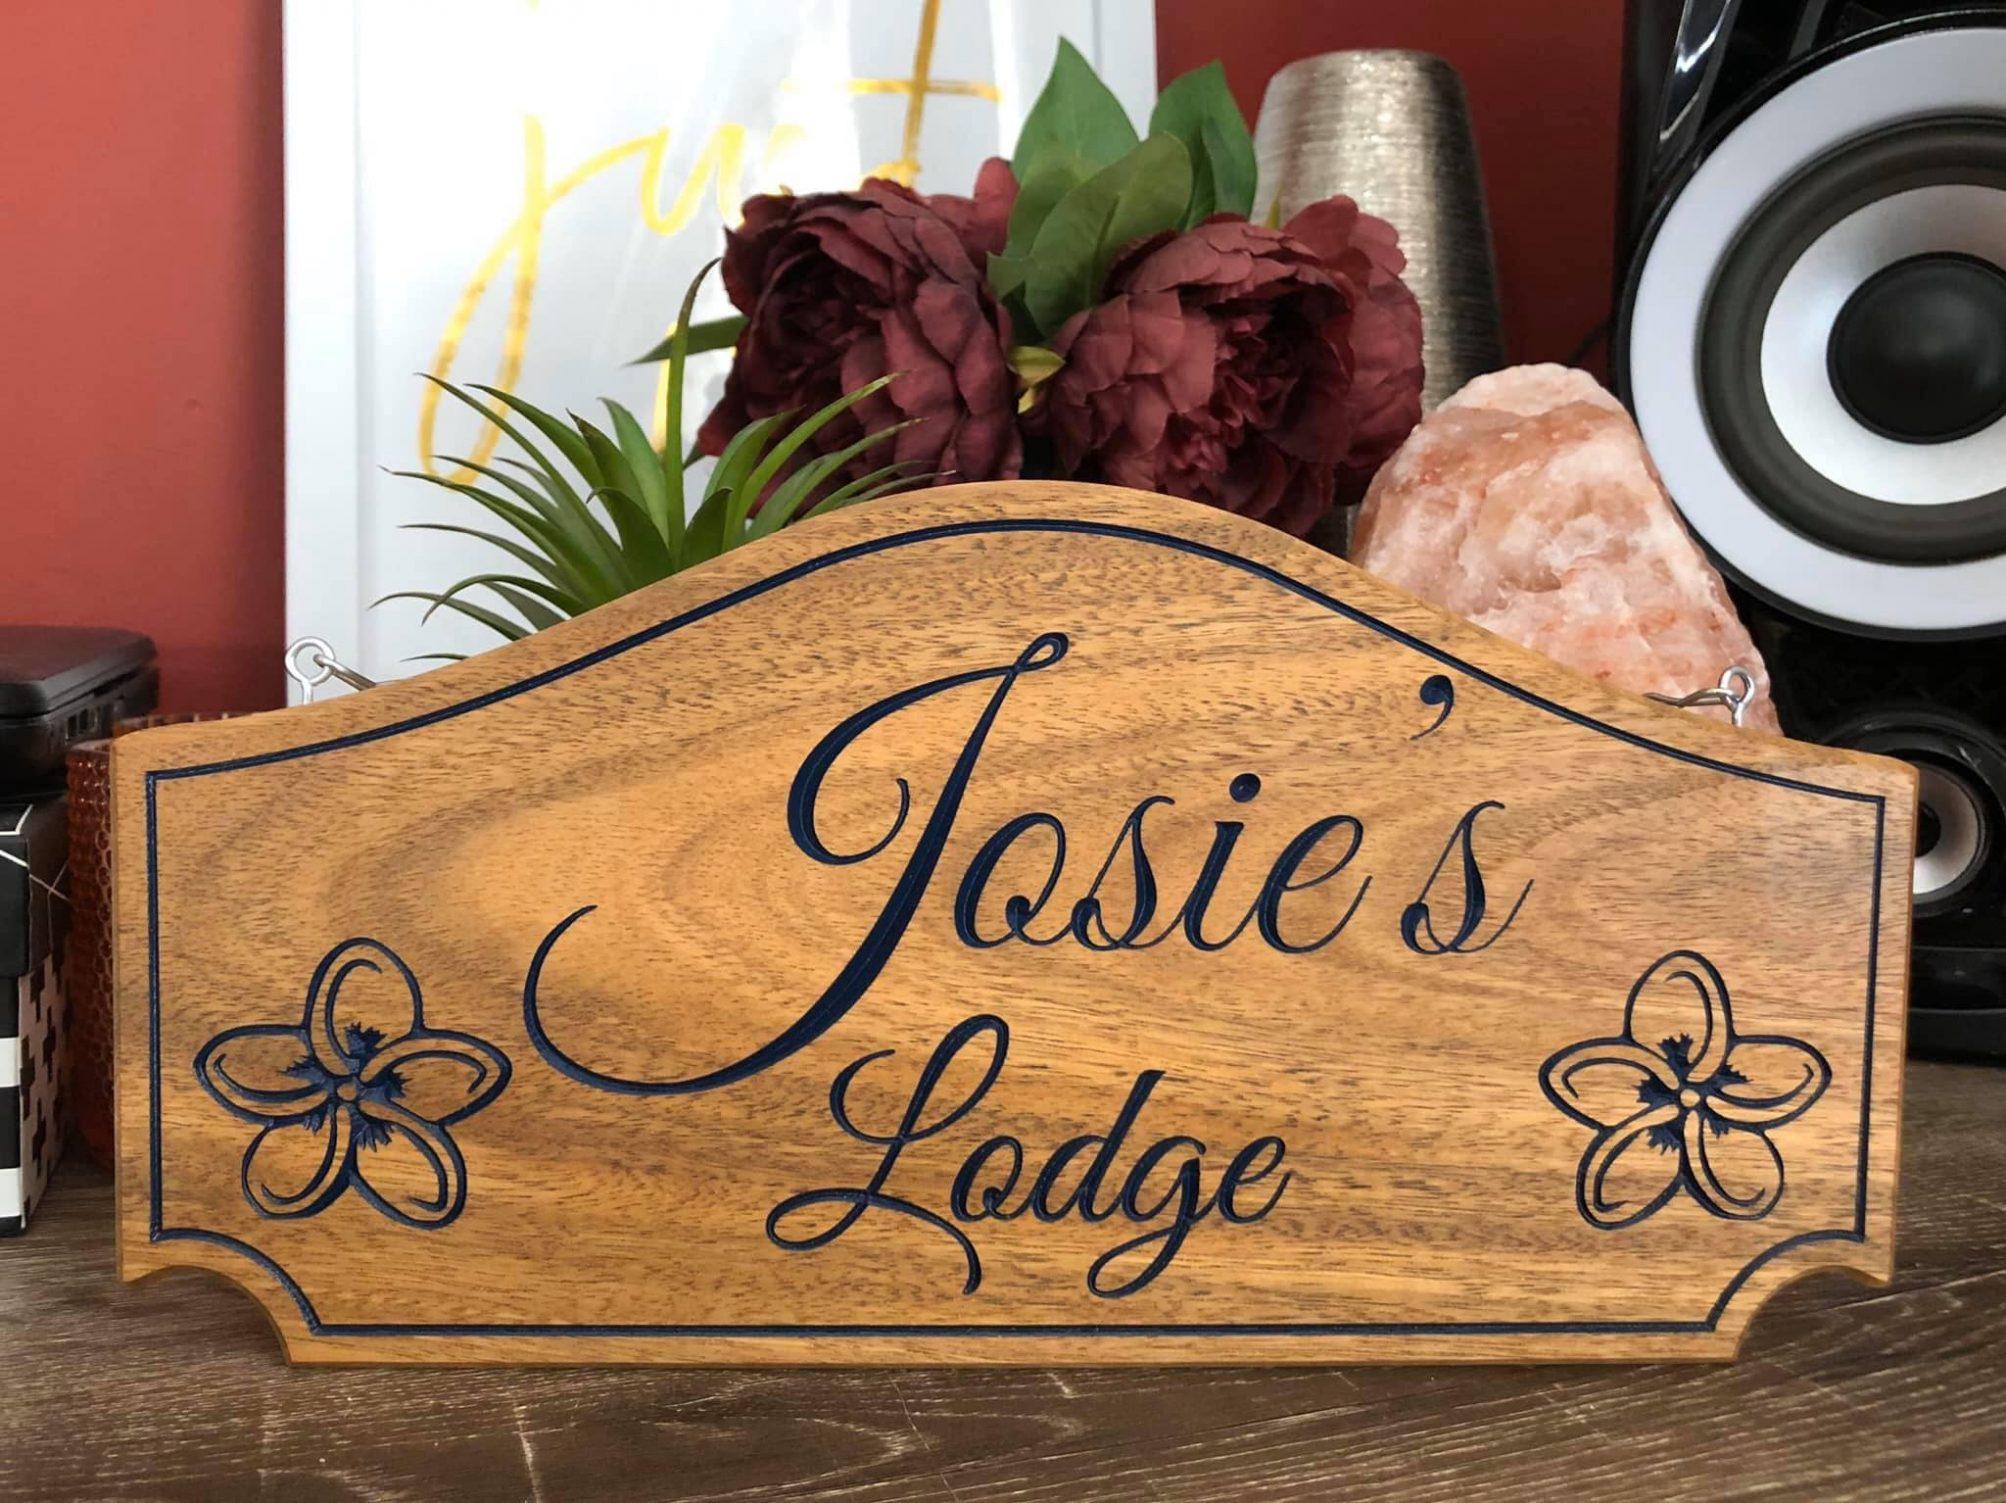 Josie's Lodge